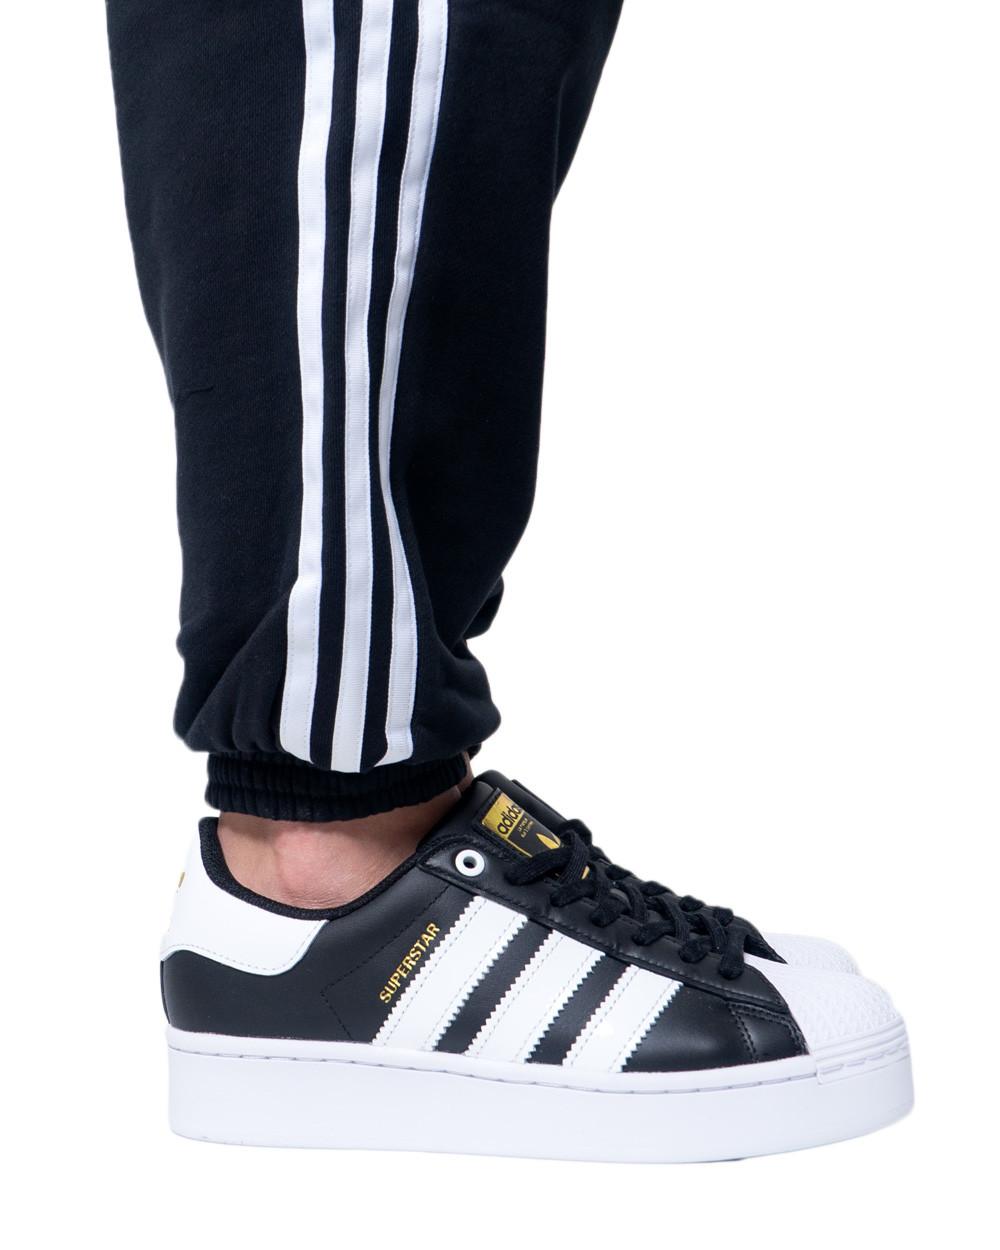 adidasMarchio: Adidas; Genere: Donna; Tipologia: Calzat…